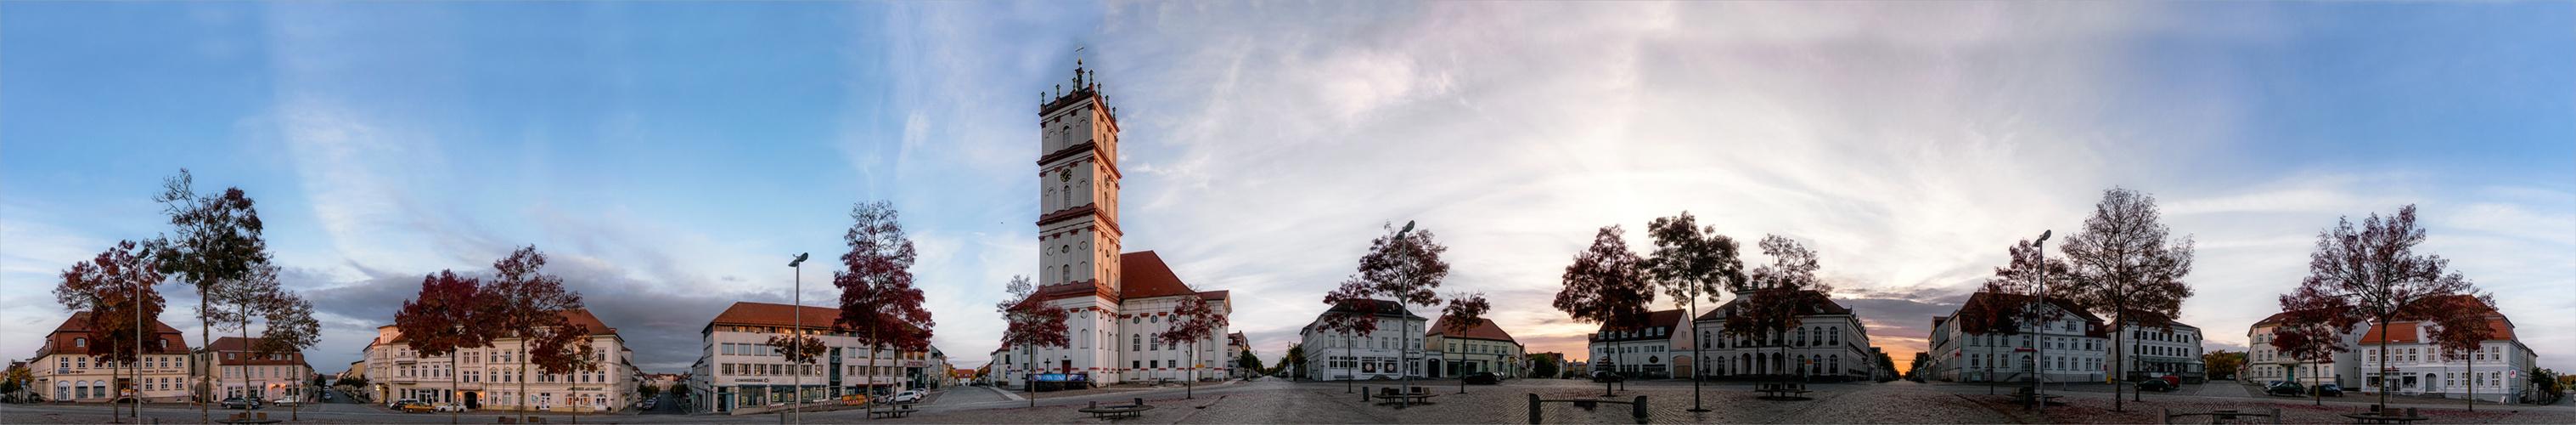 Marktplatz Neustrelitz (2) ...